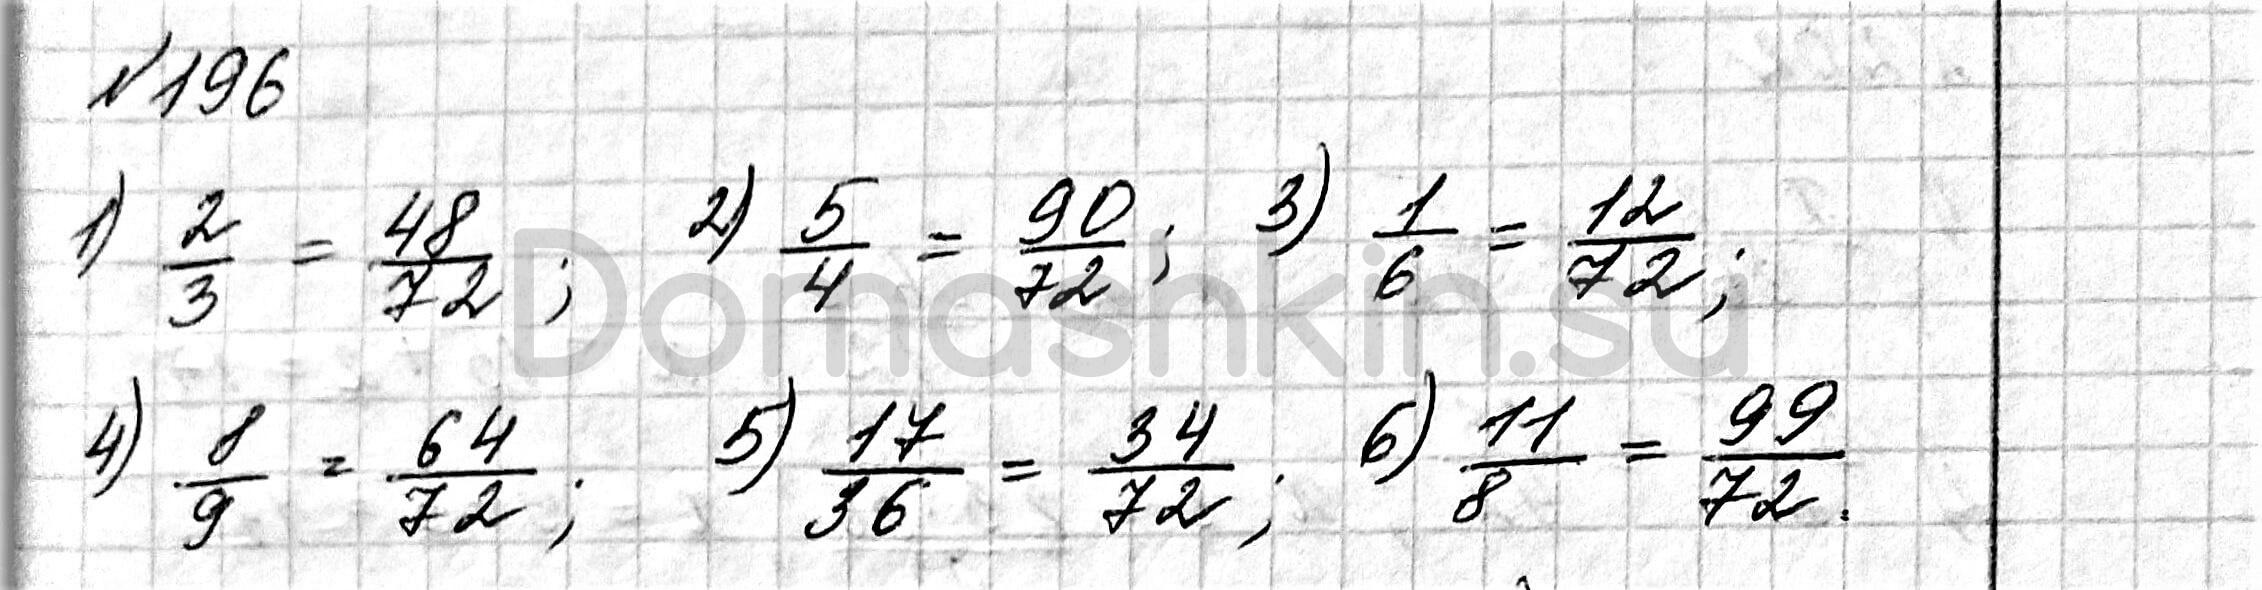 Математика 6 класс учебник Мерзляк номер 196 решение